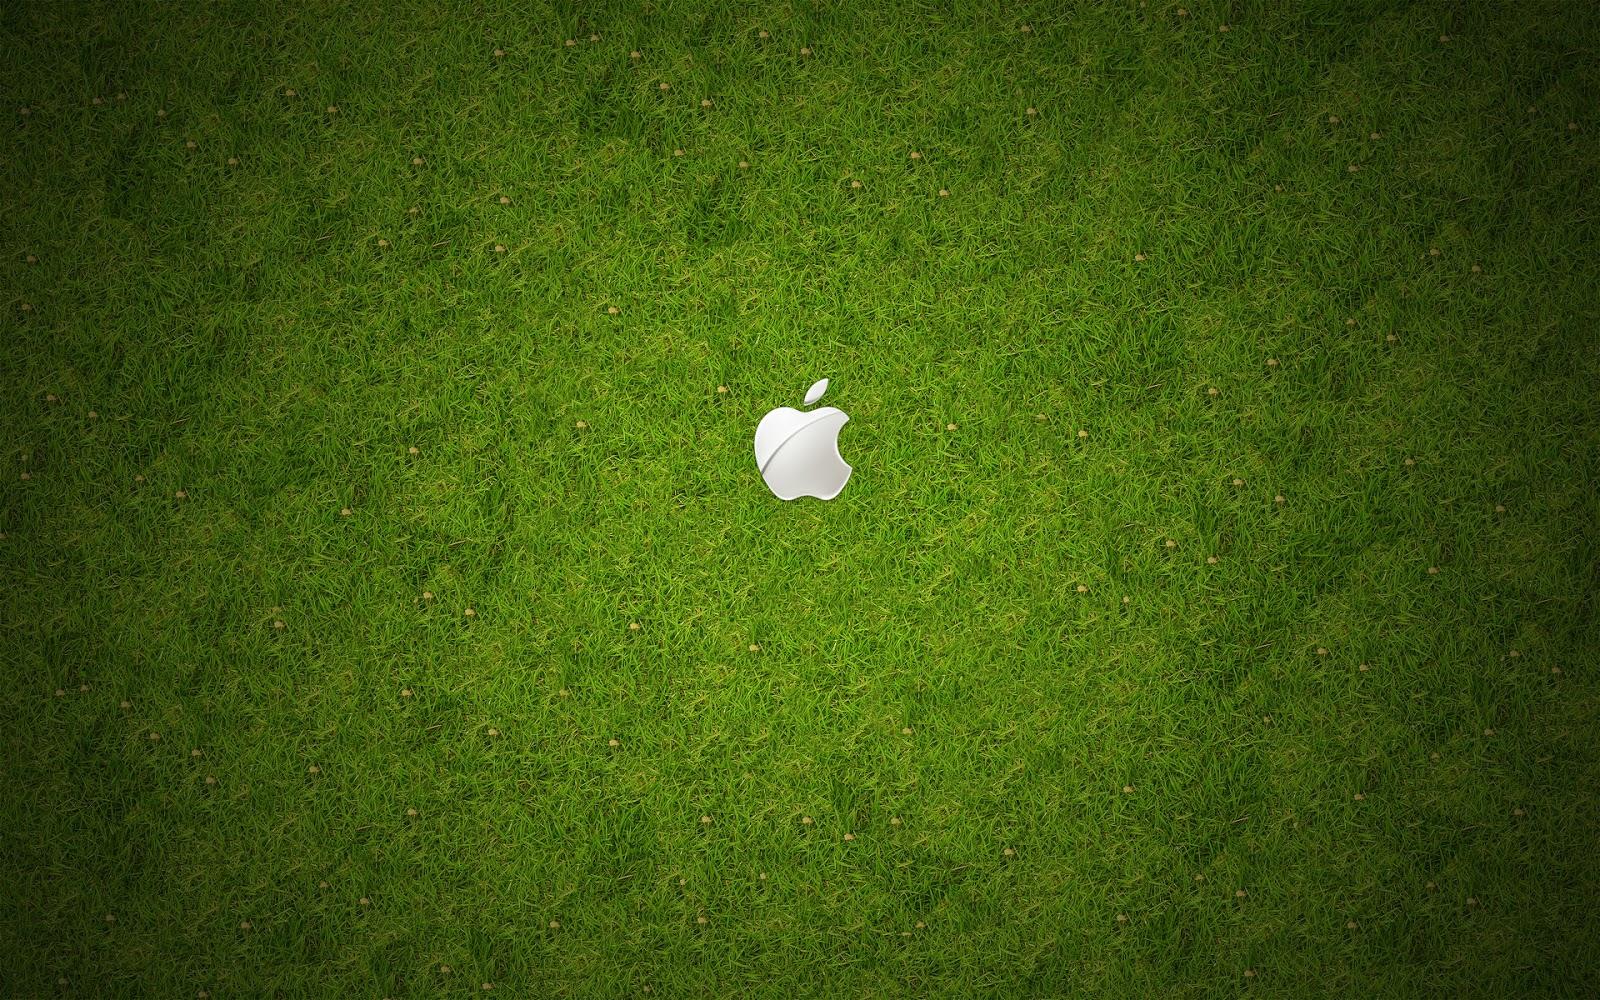 HD Apple Mac Backgrounds Wallpaper 1600x1000